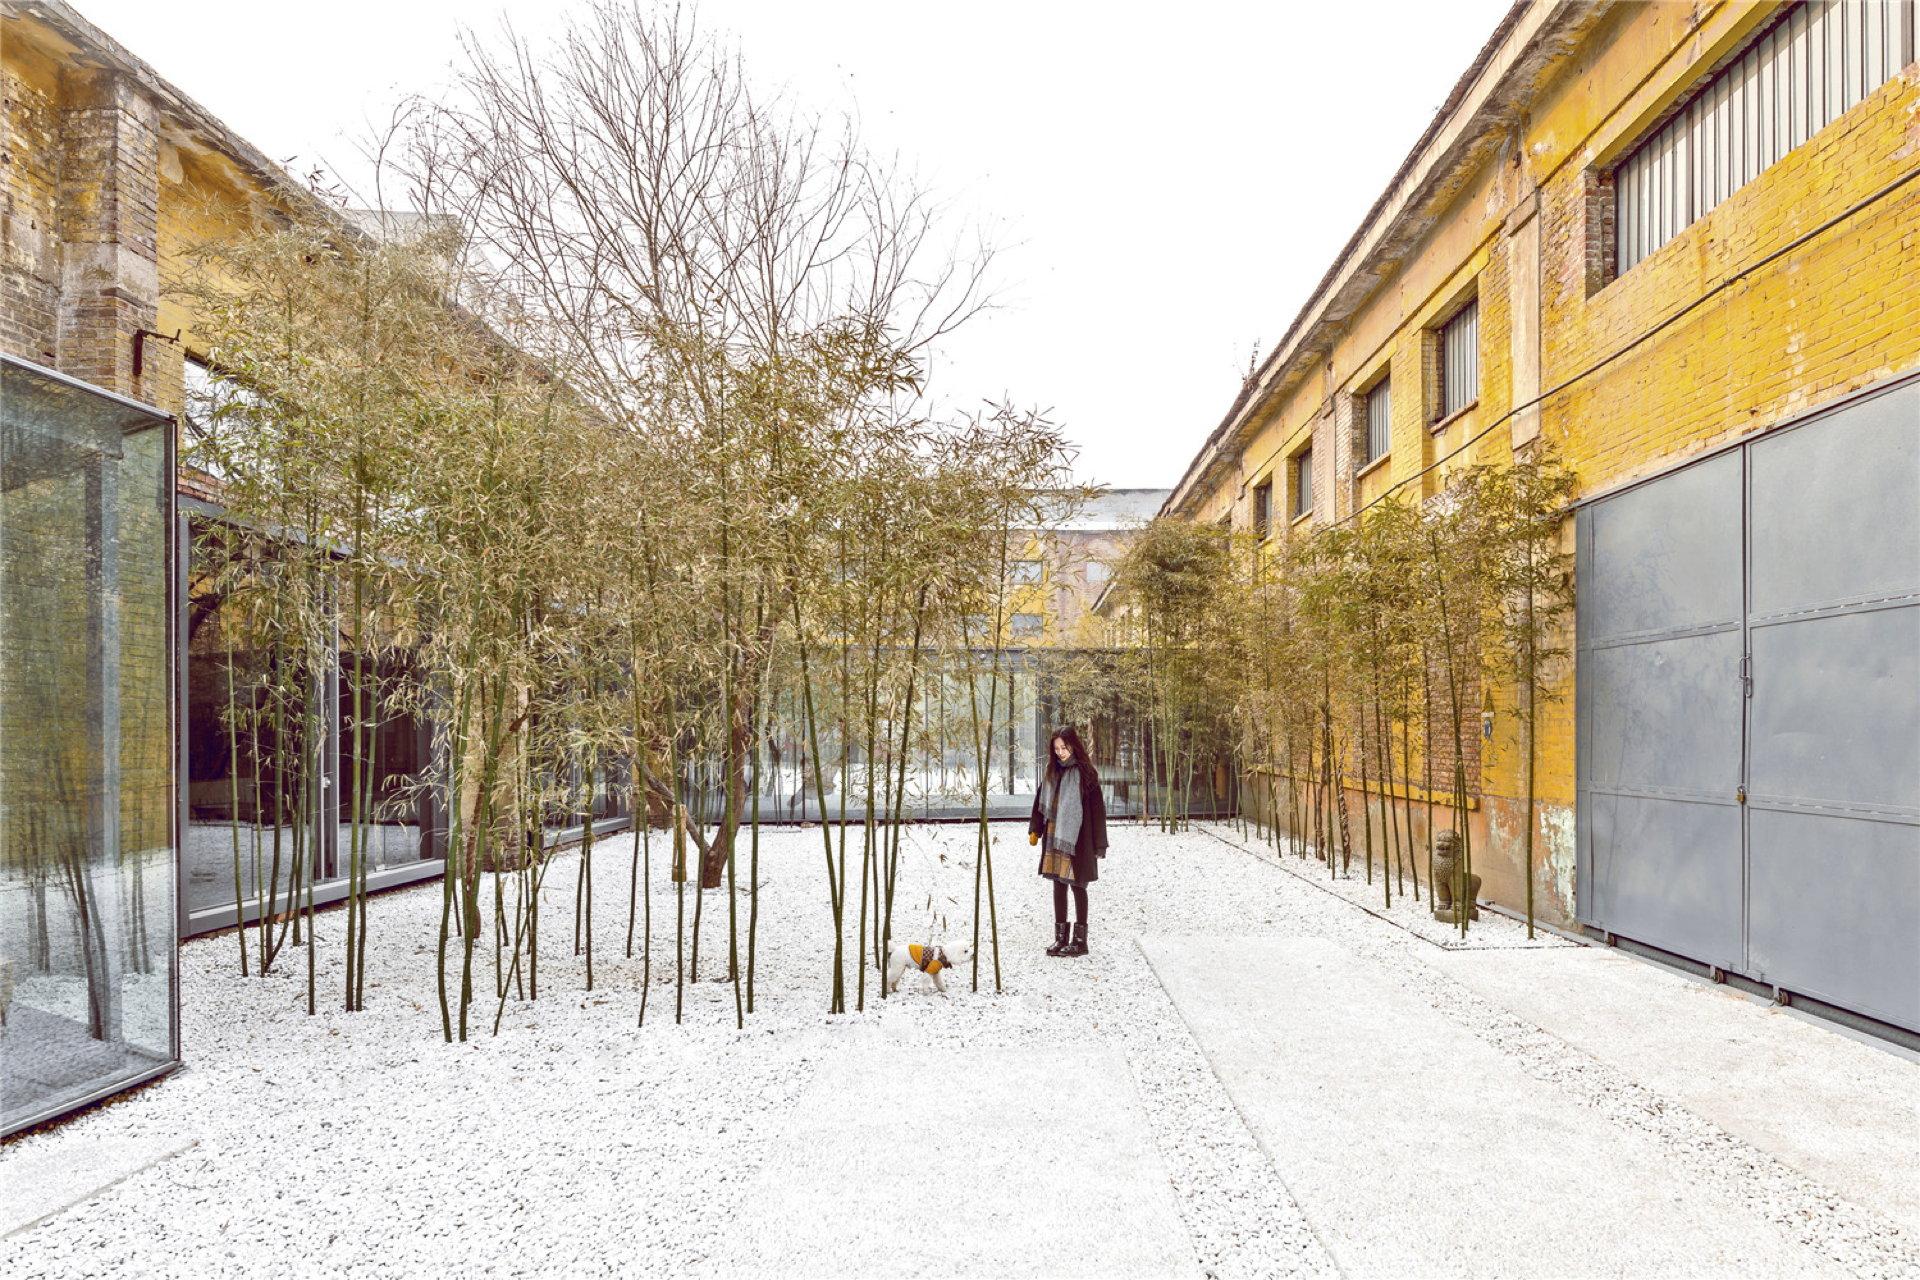 Archstudio: The Great Wall Museum of Fine Art en Zi Bo (China)